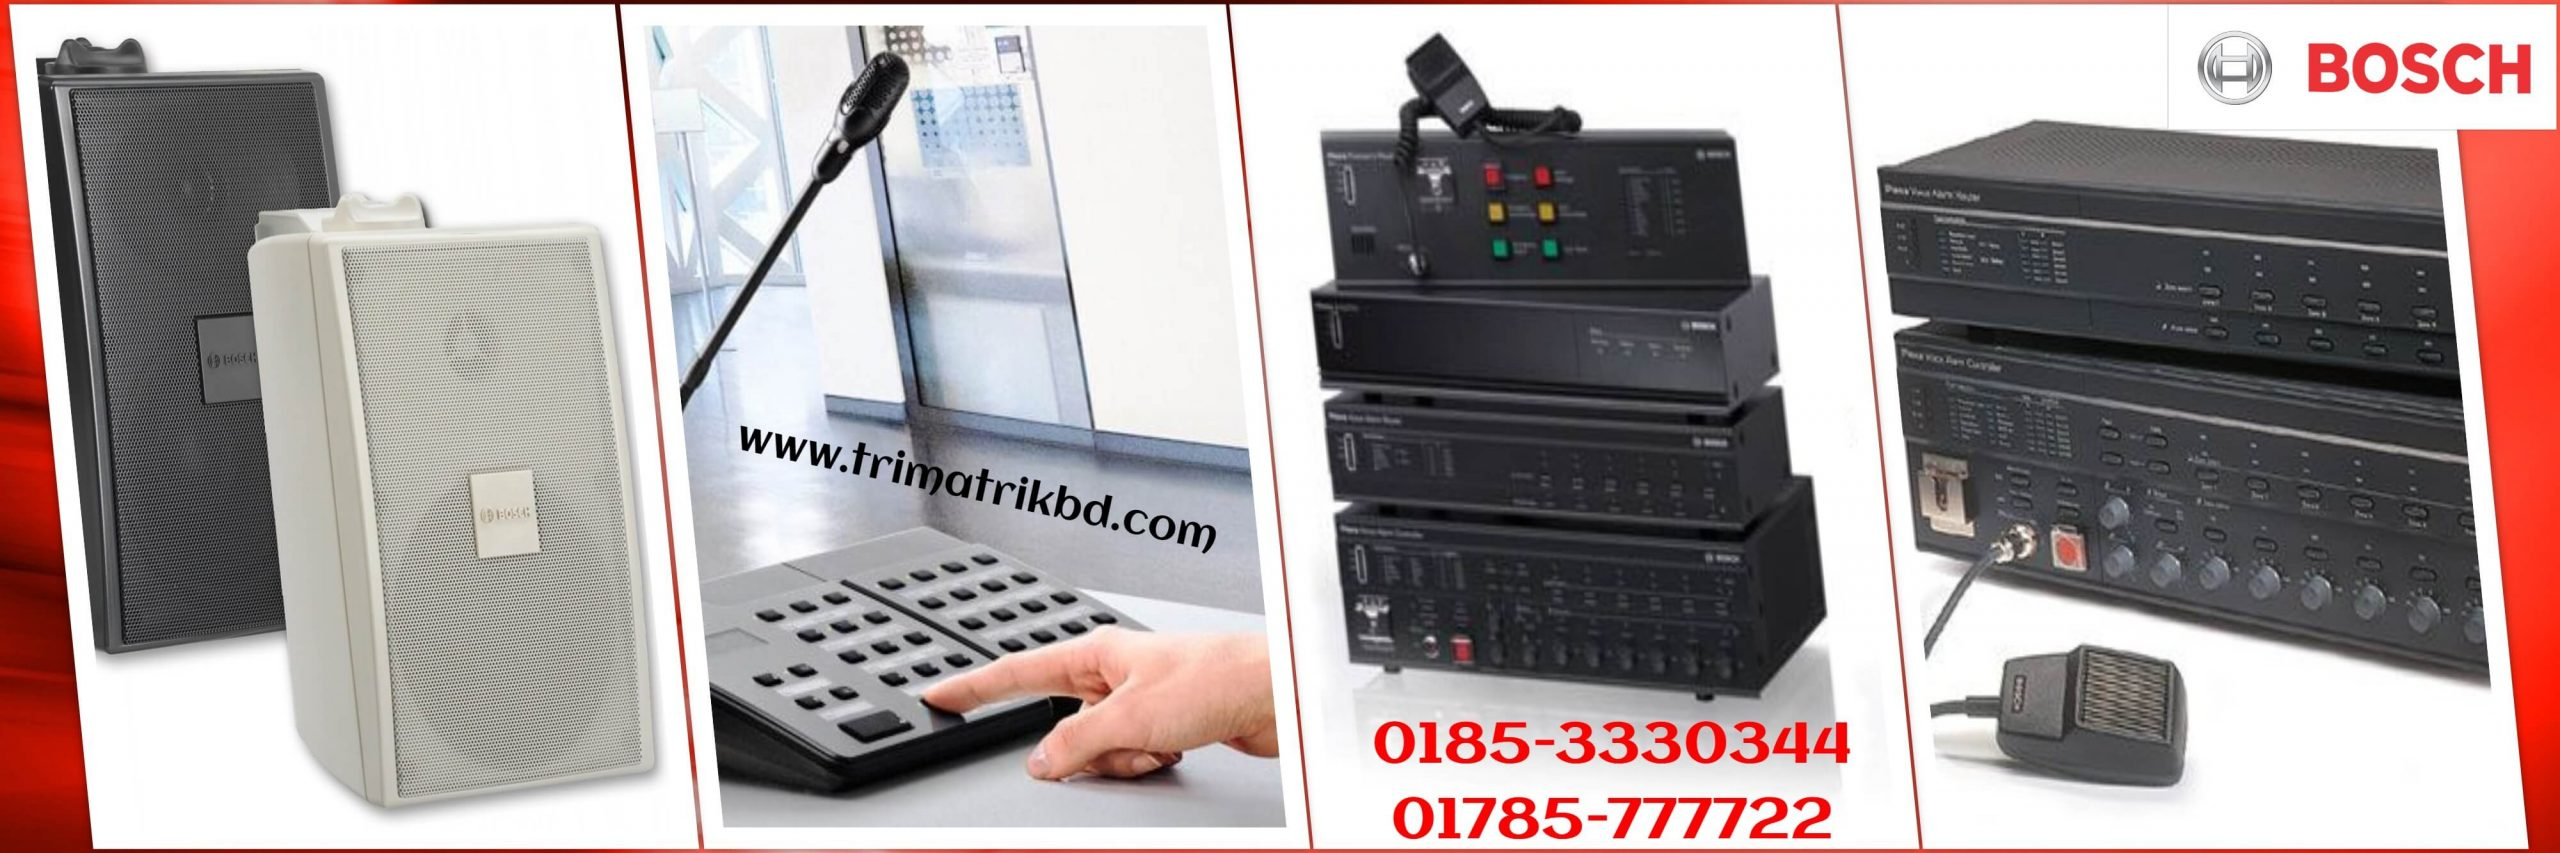 Bosch Sound System in Bangladesh